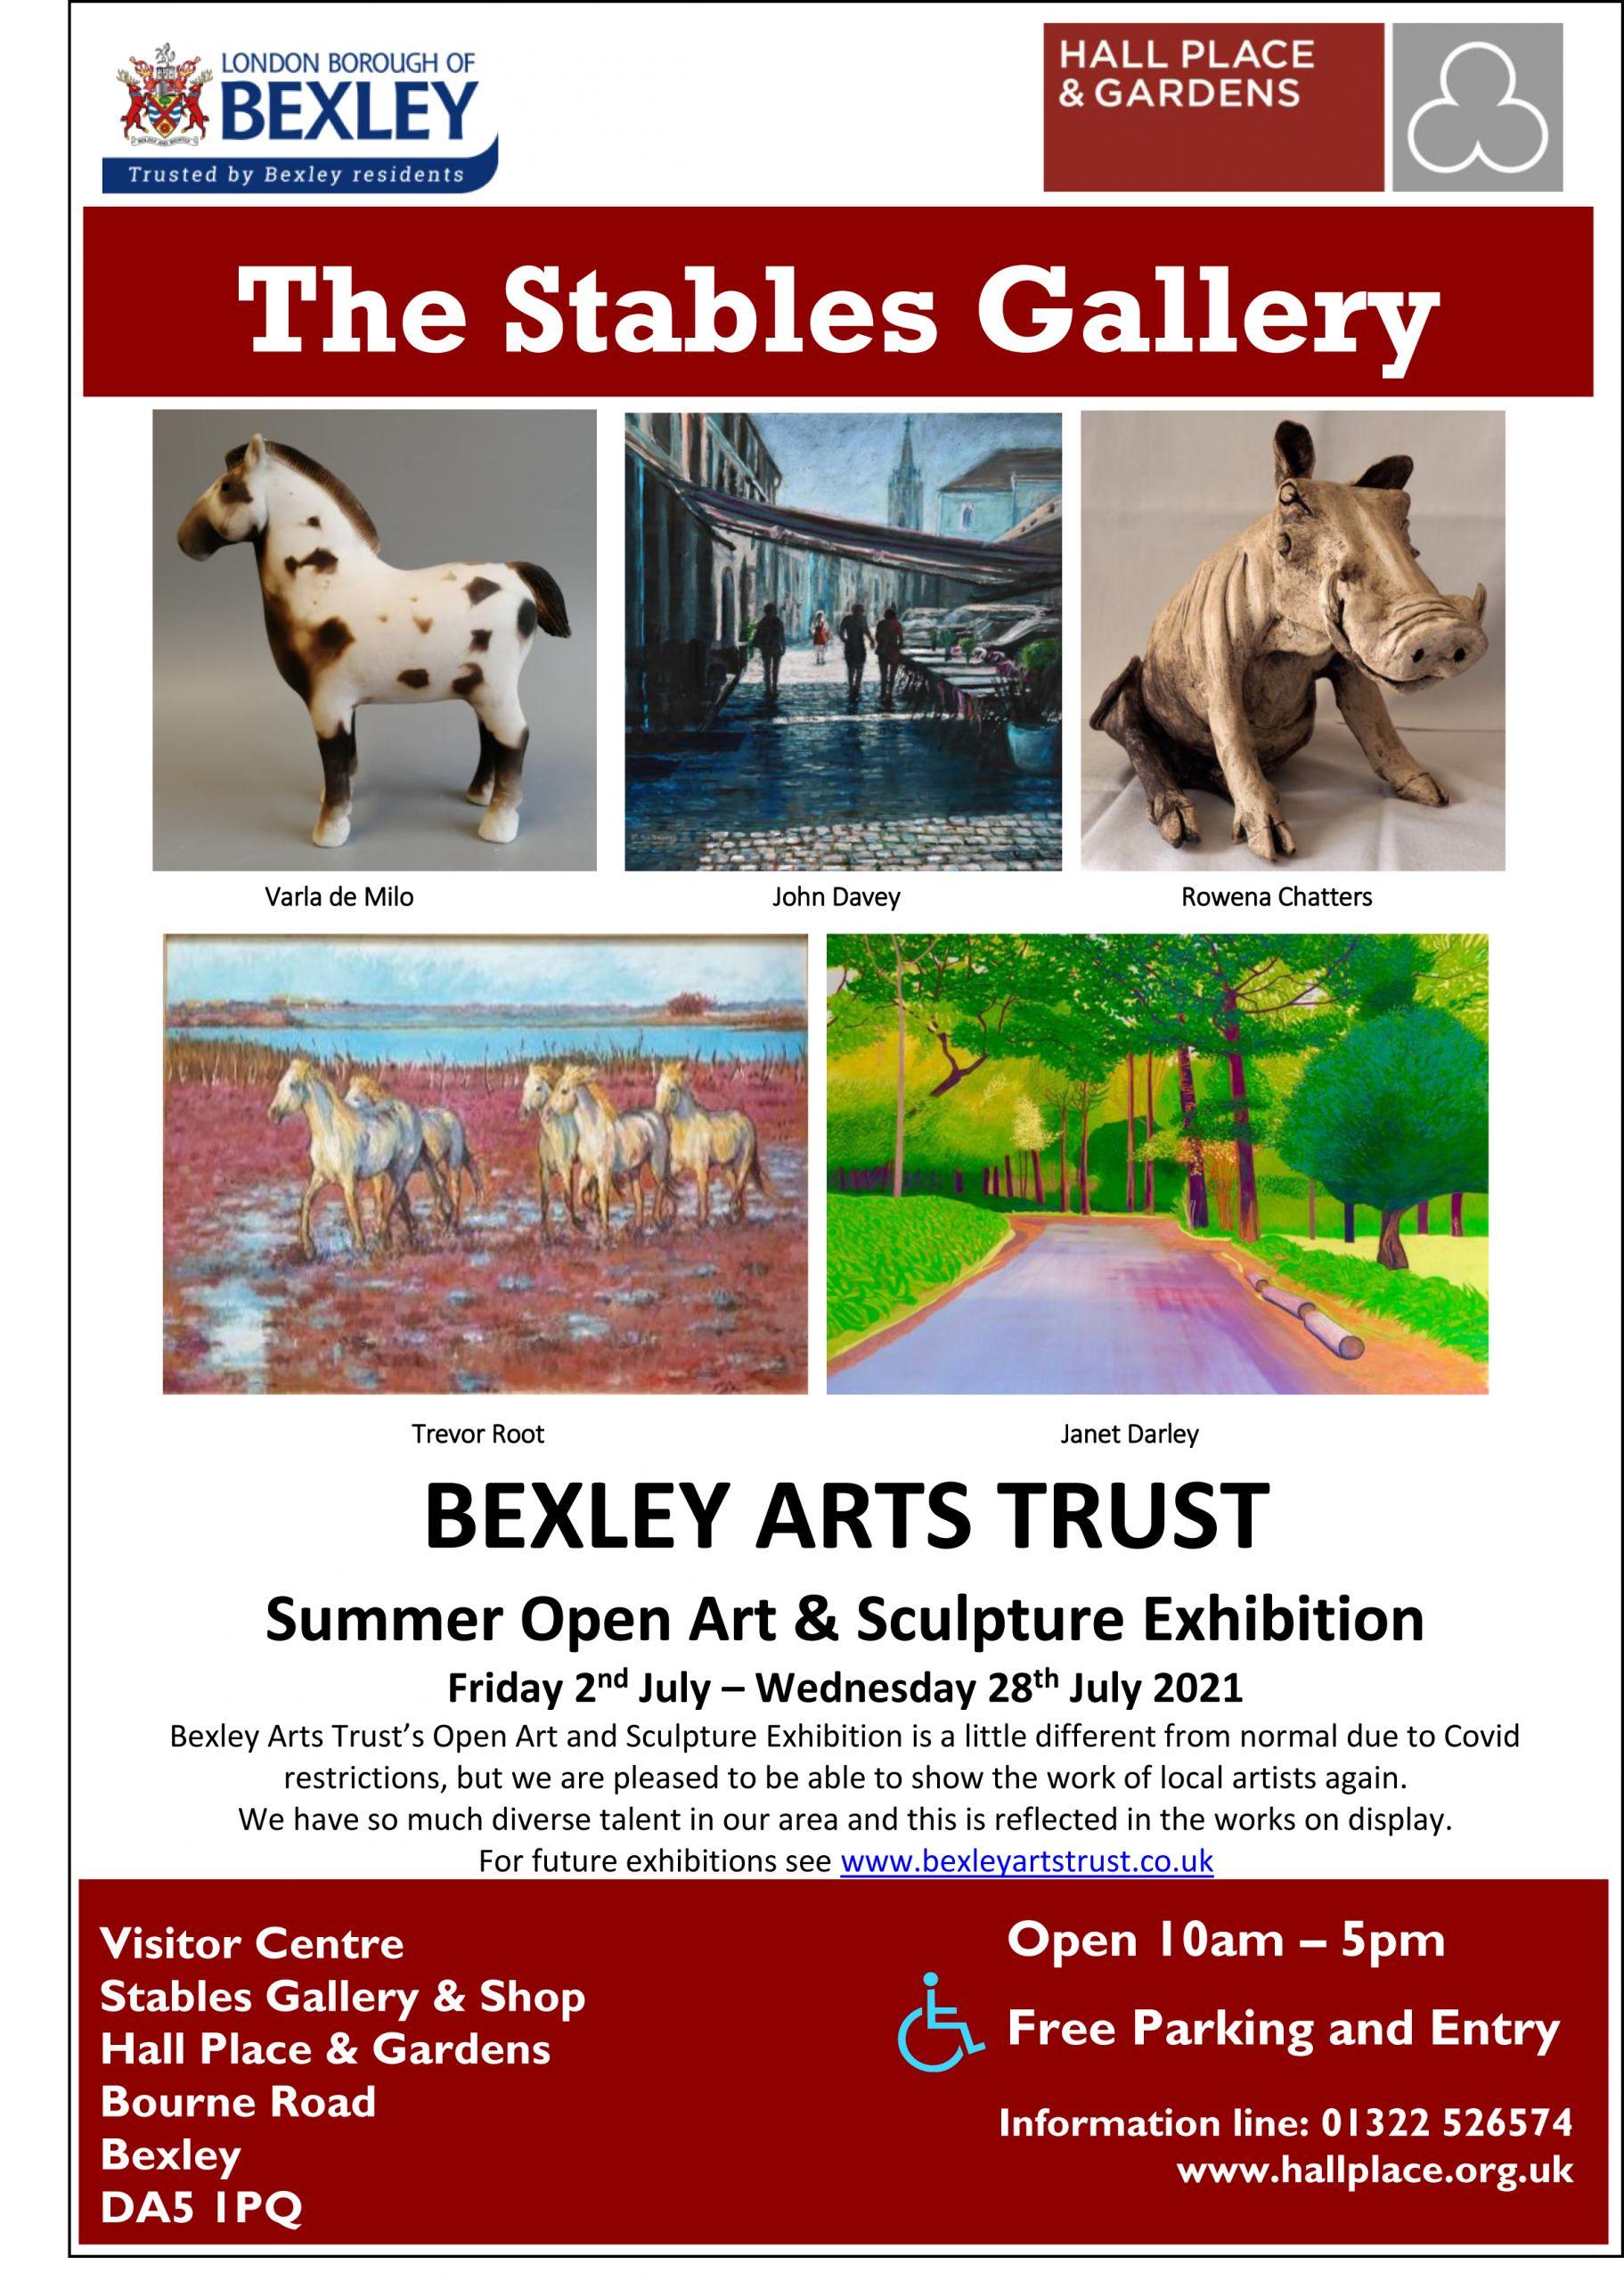 Bexley Arts Trust exhibition poster